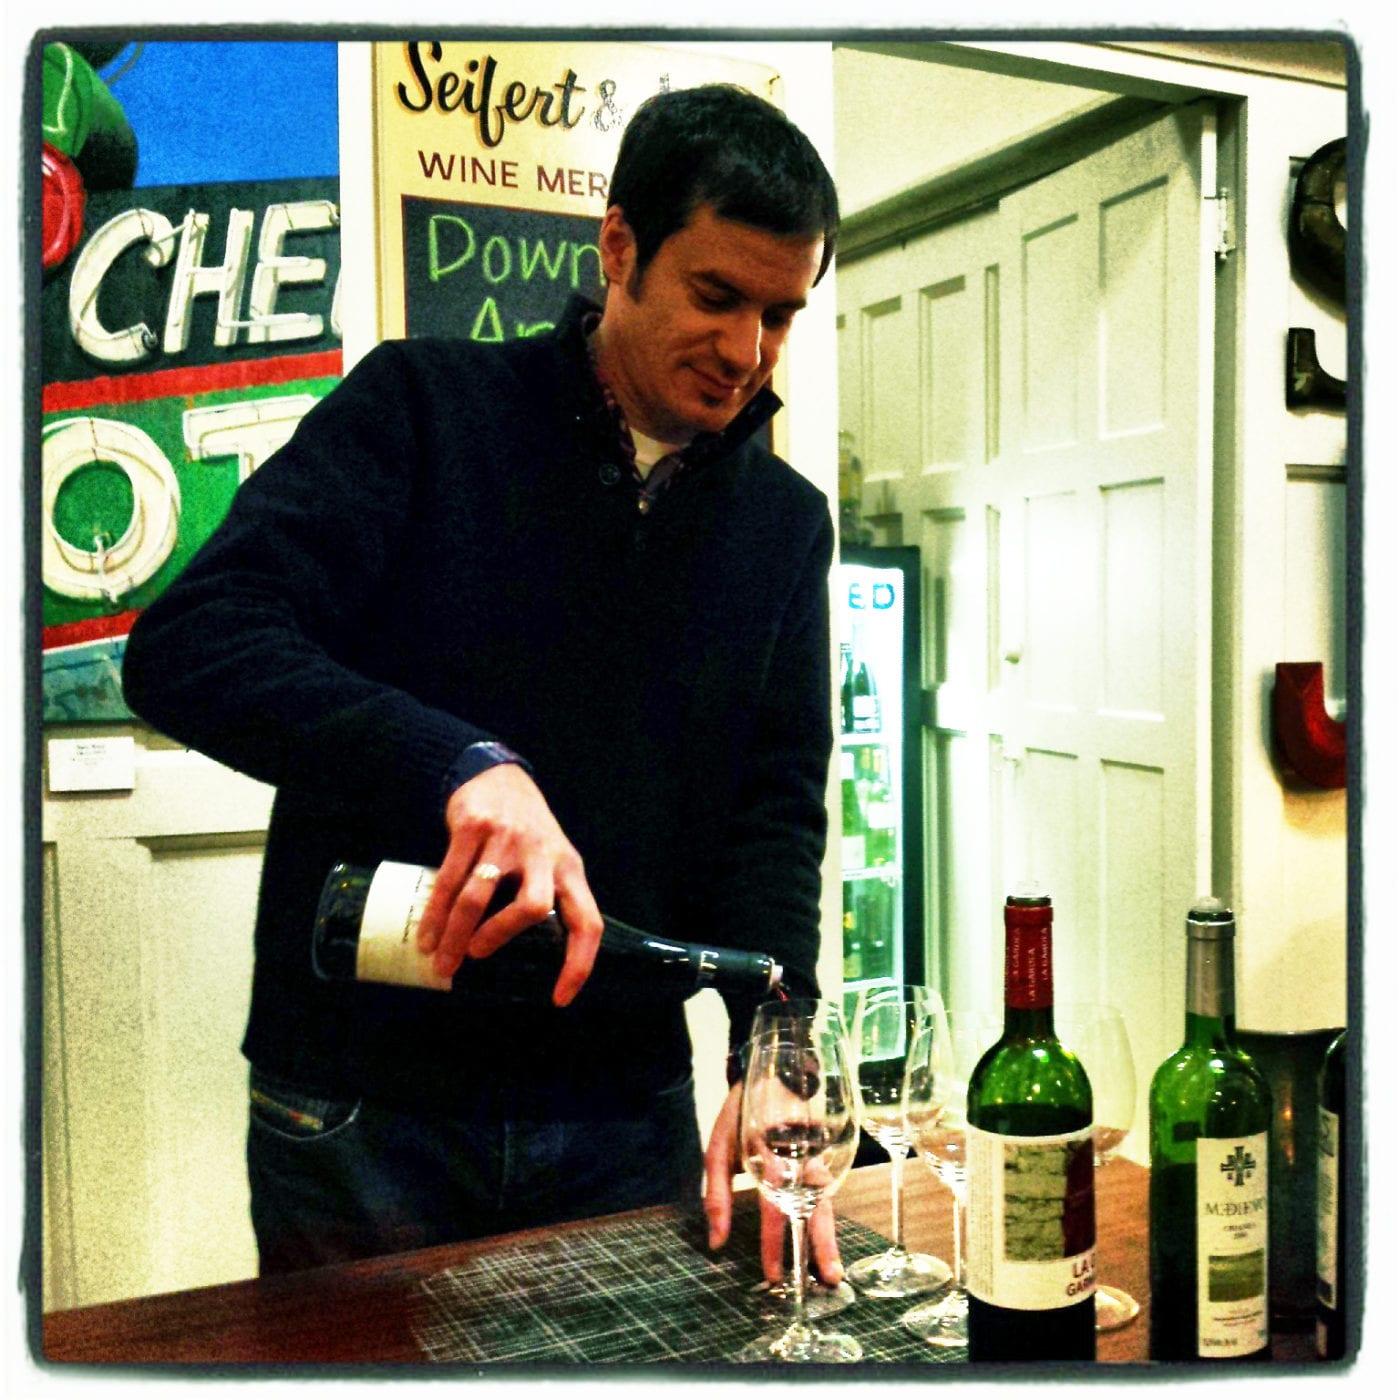 Seifert&Jones, Wine Shop, Wine Tasting, Bellingham, WA